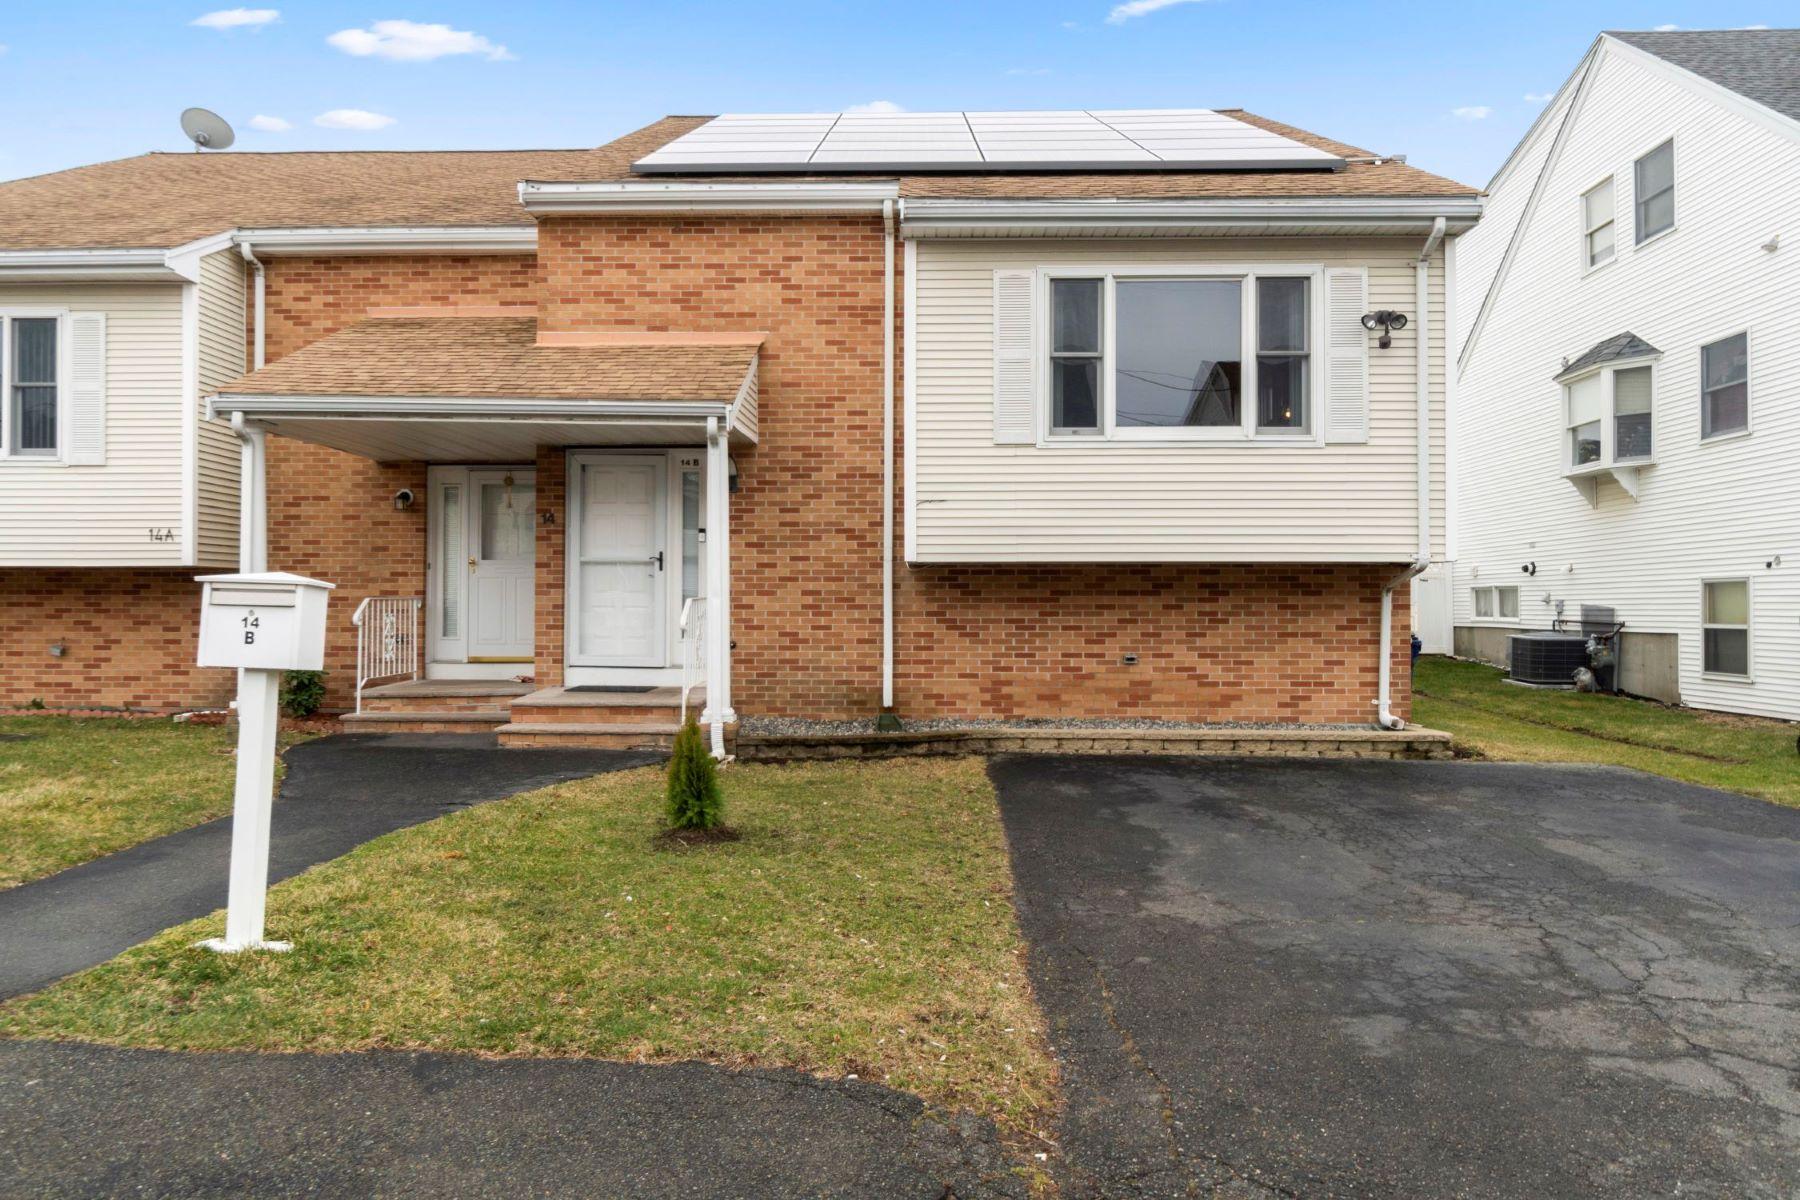 Condominiums για την Πώληση στο 14B Philomena Avenue Unit B, Revere, Μασαχουσετη 02151 Ηνωμένες Πολιτείες